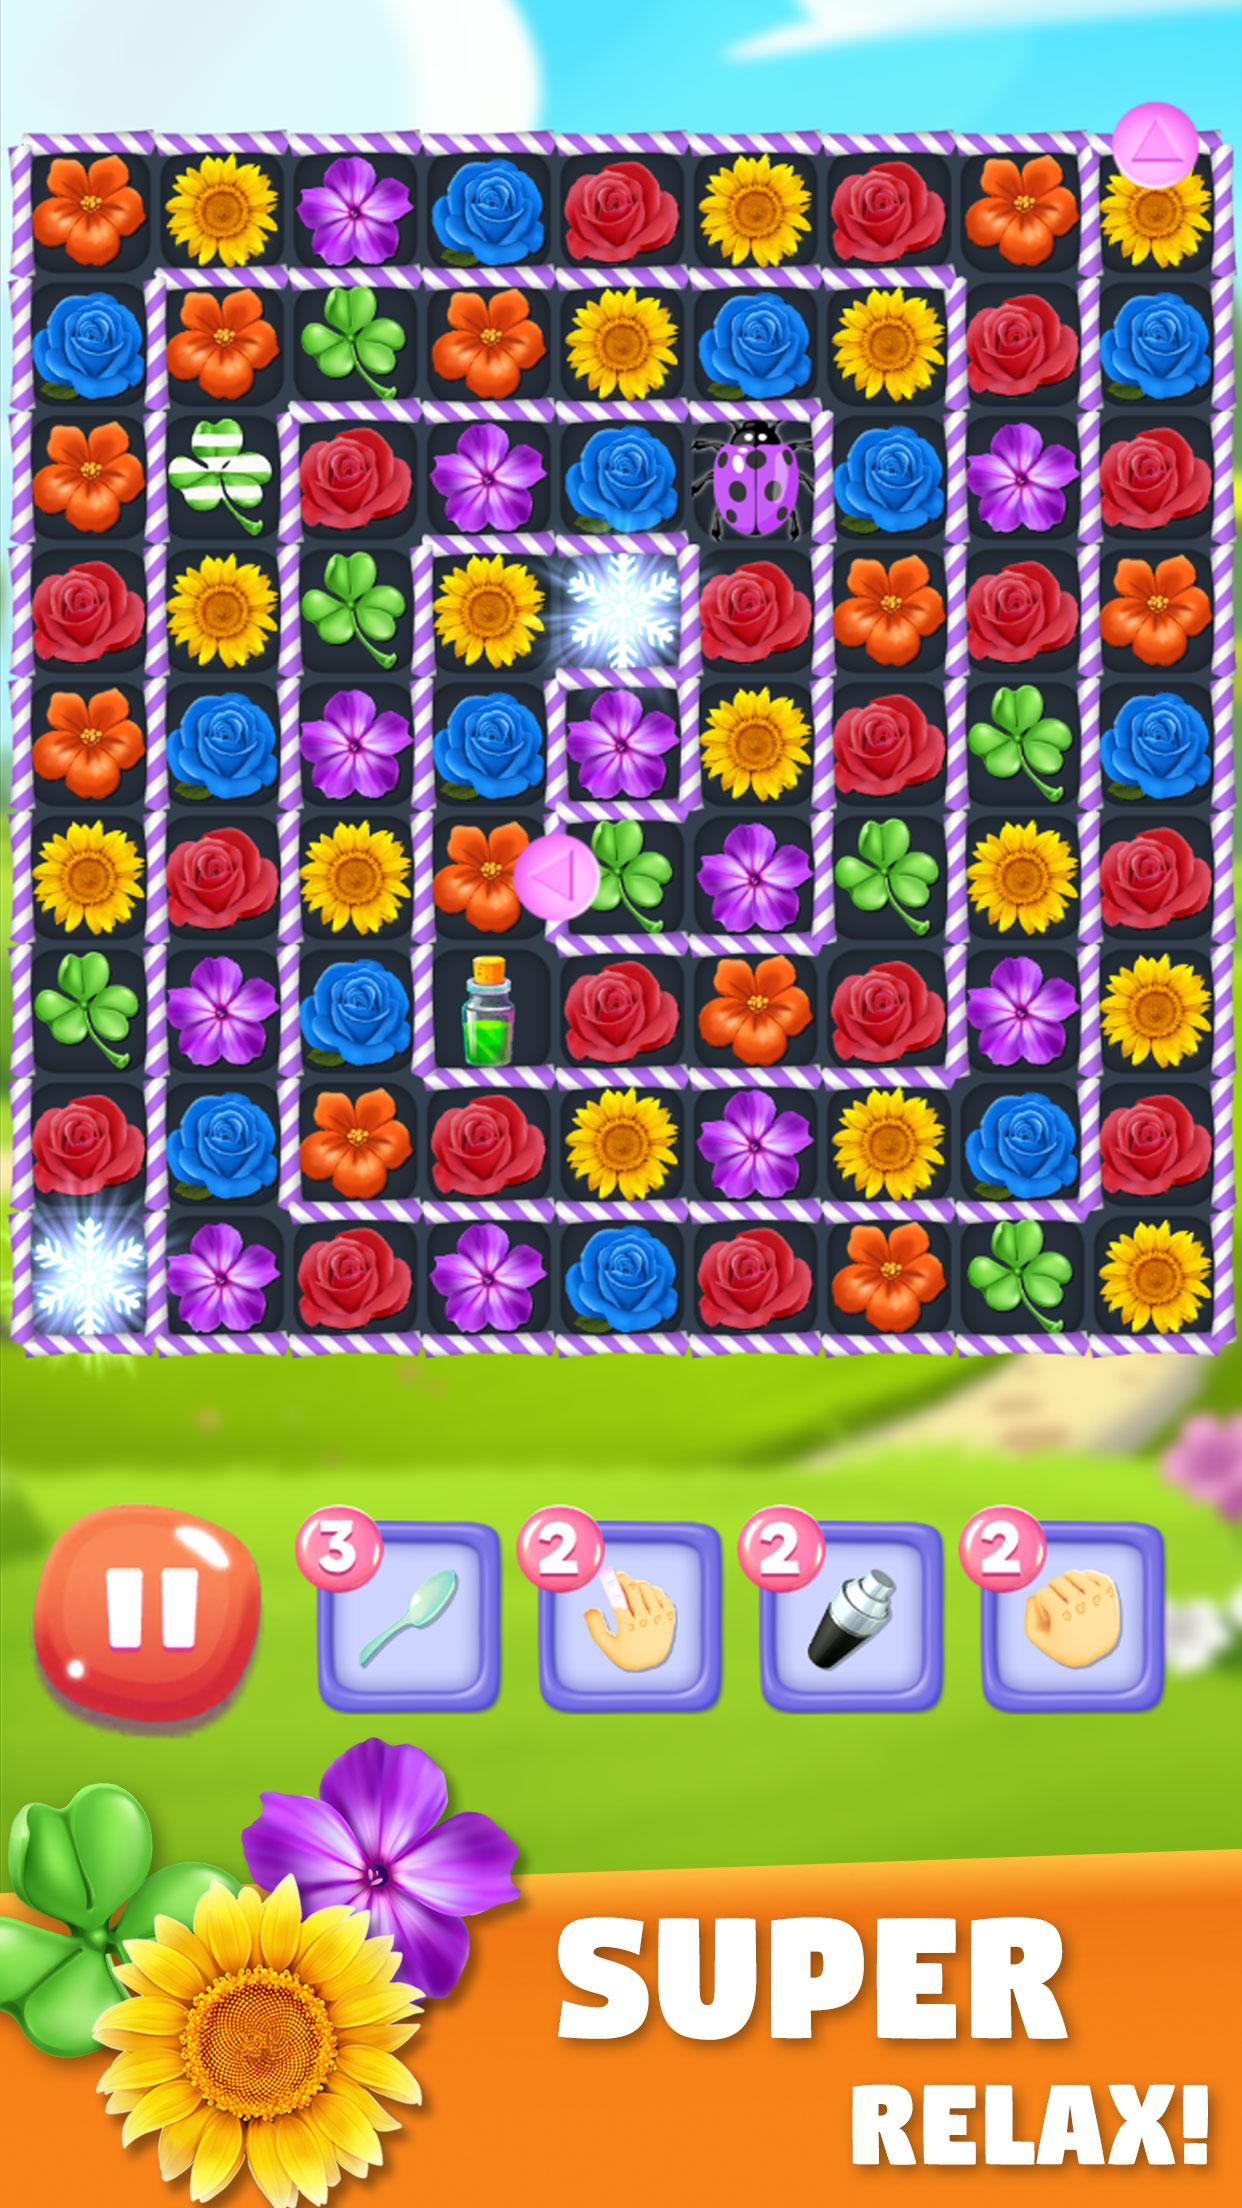 Blossom Bloom Flower Blast Match 3 Games 1.9 Screenshot 2